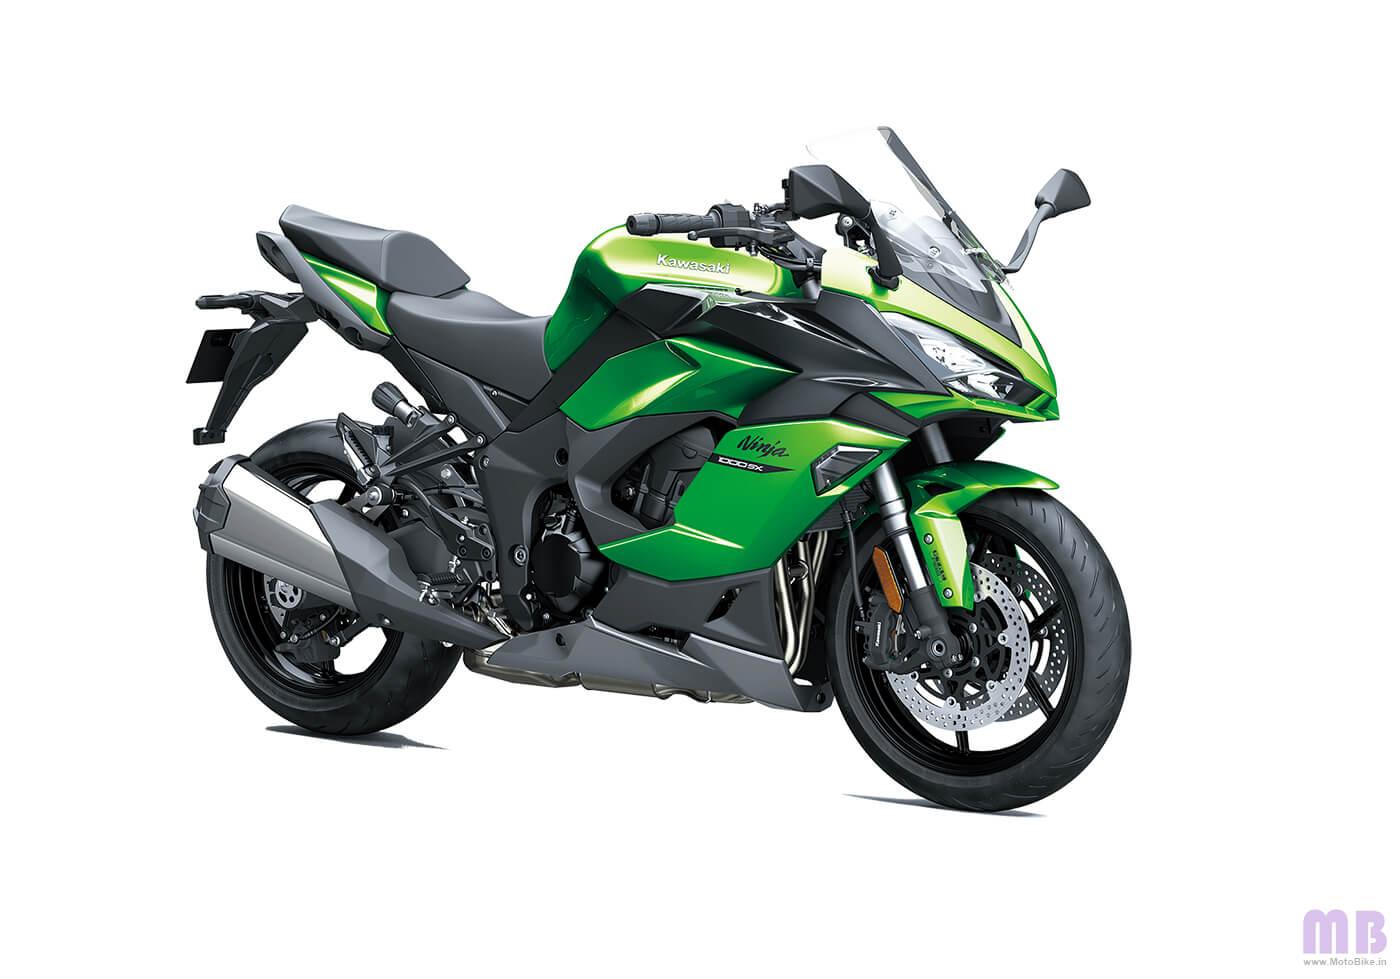 Kawasaki Ninja 1000SX - Emerald Blazed Green